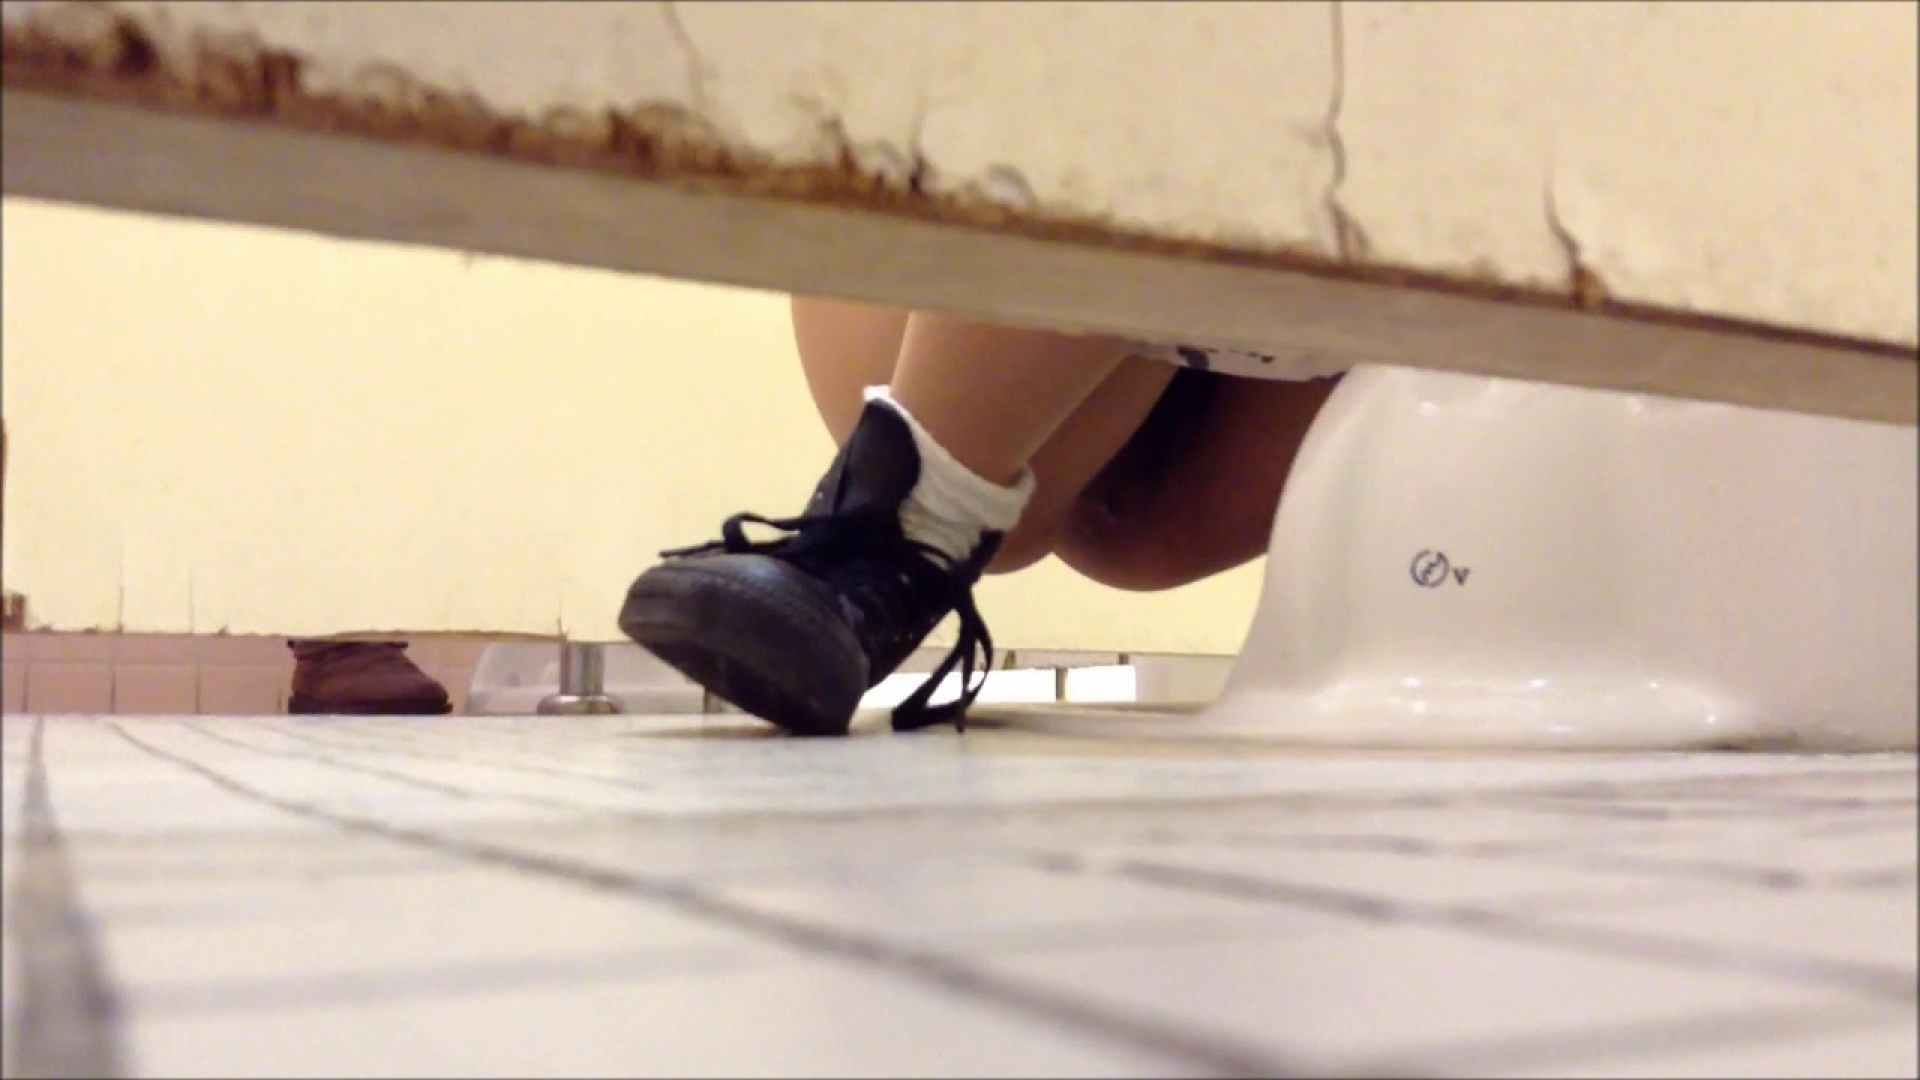 某有名大学女性洗面所 vol.01 和式 すけべAV動画紹介 80pic 40